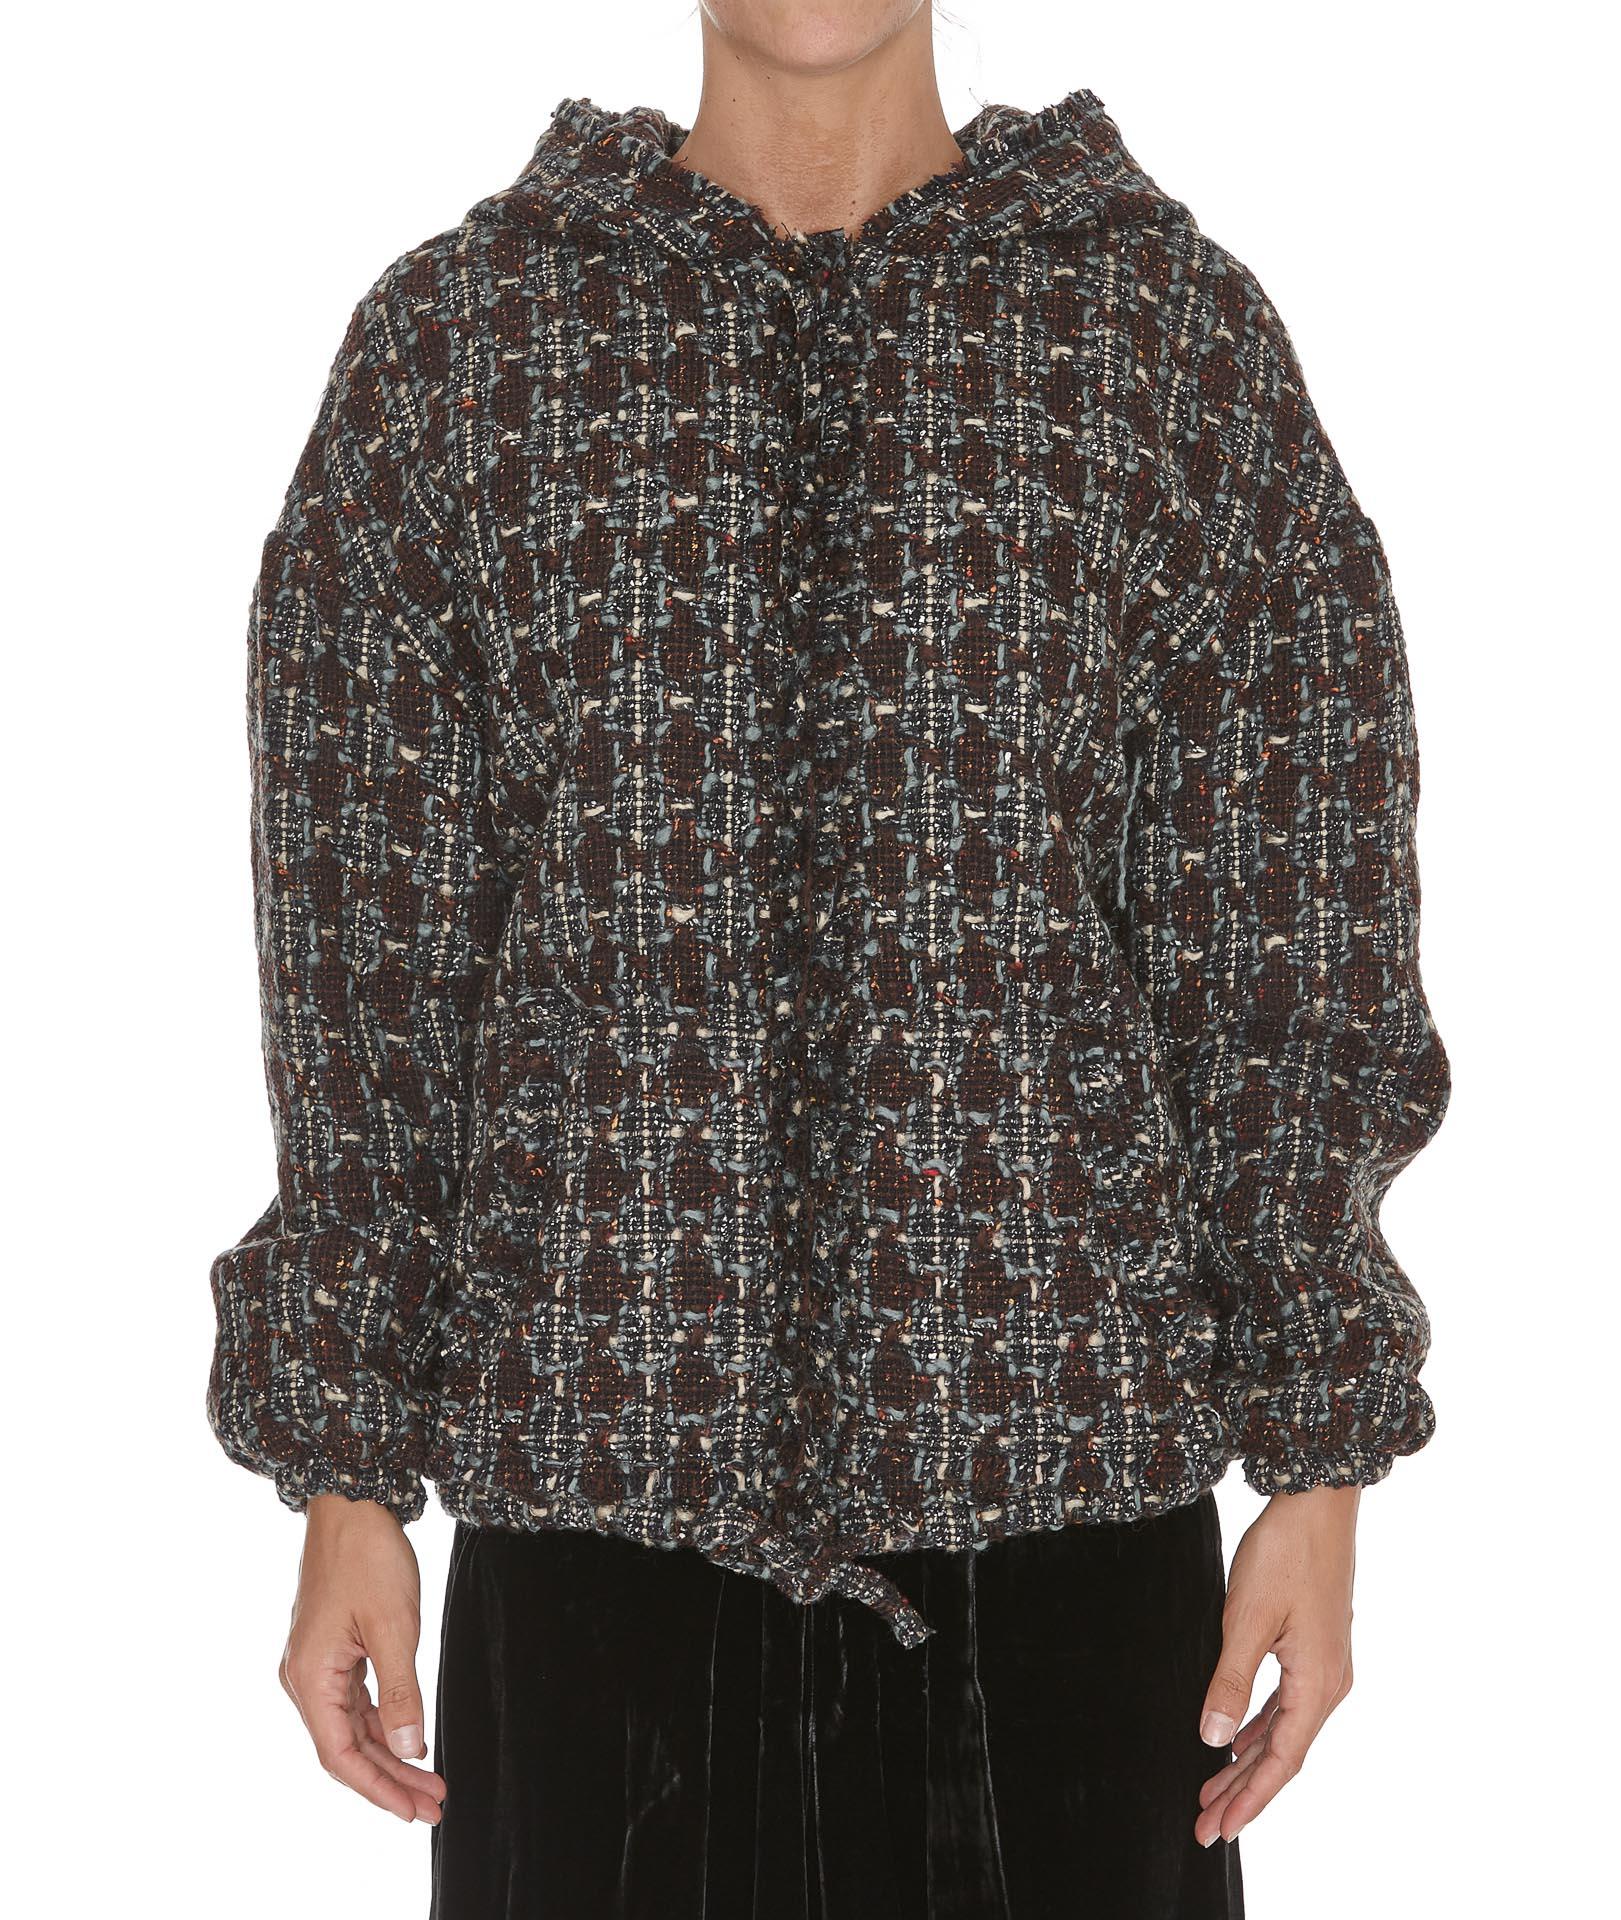 Isabel Marant - Isabel Marant Fliver Coat Jacket - Burgundy, Women's Coats | Italist